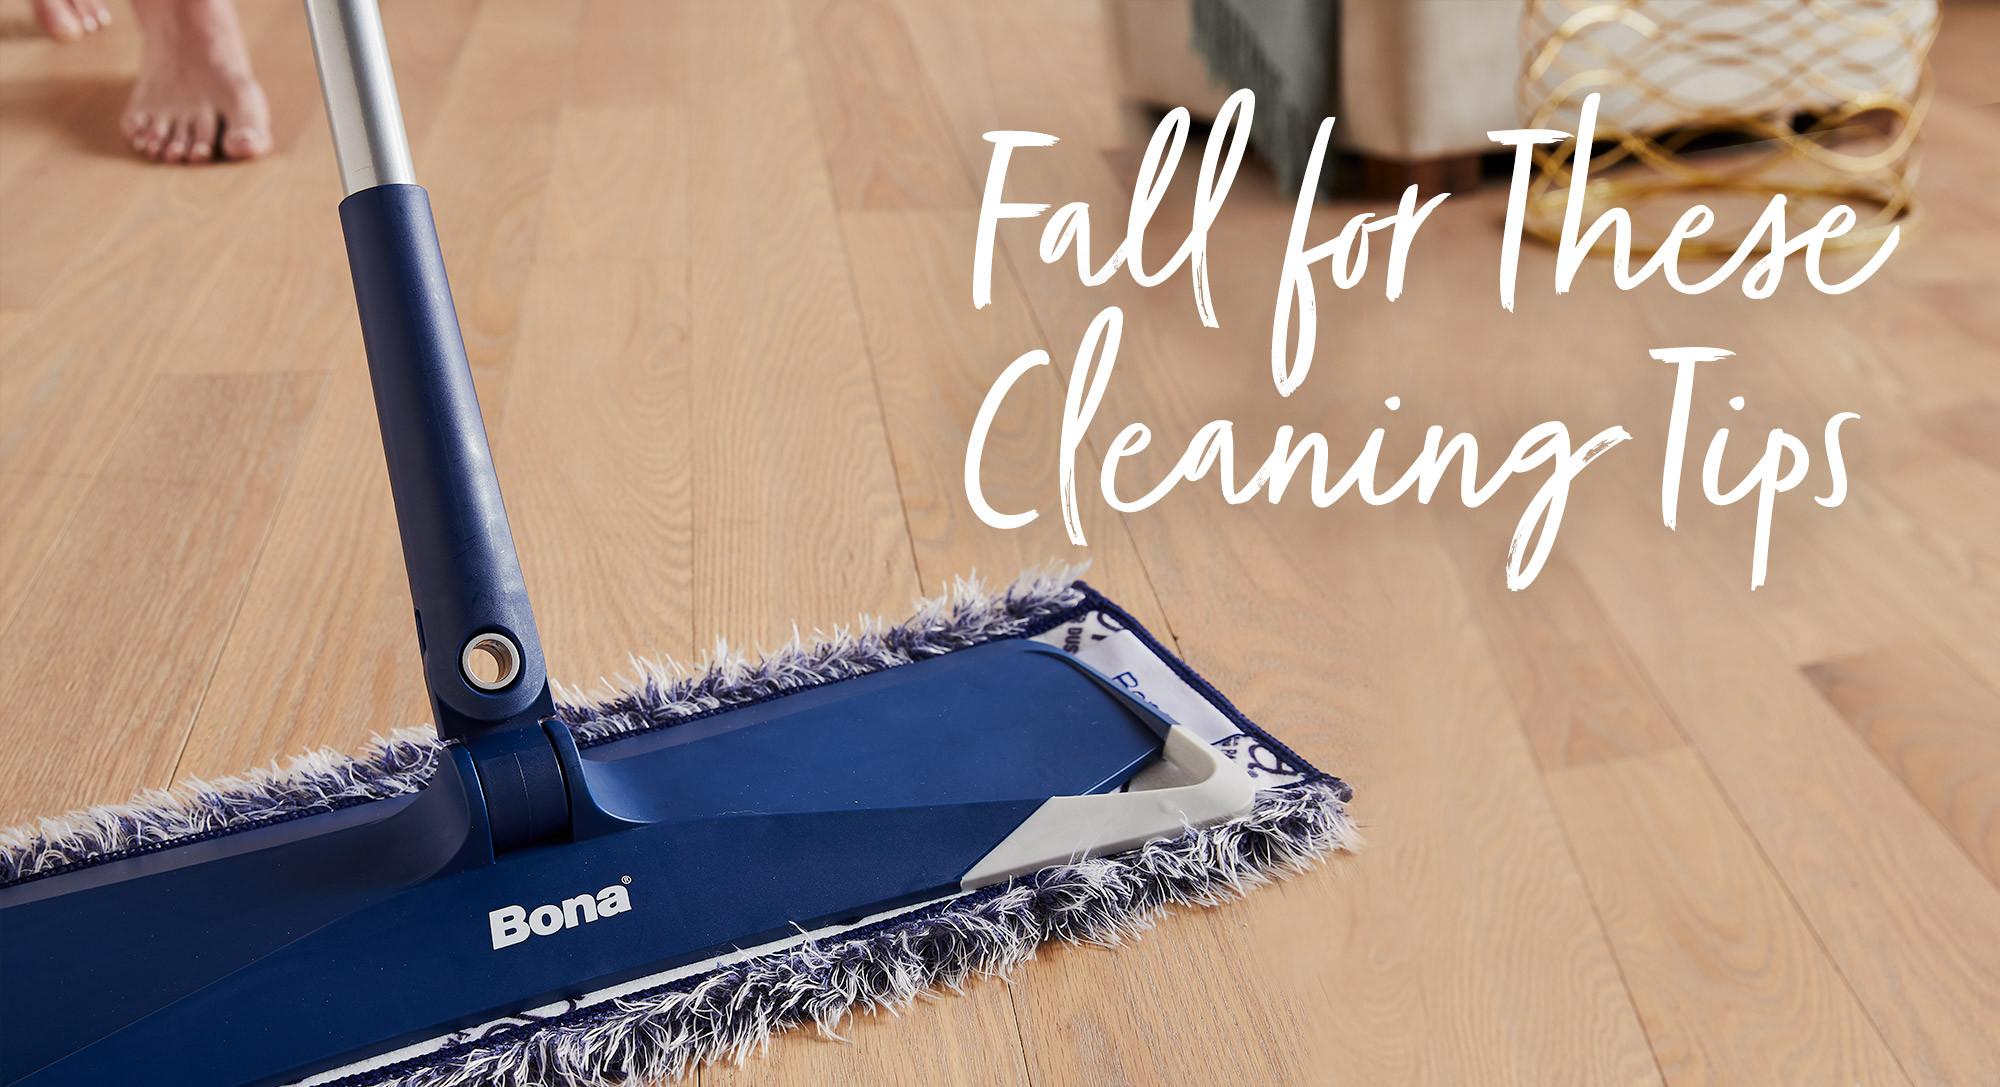 best hardwood floor steam cleaner 2015 of home bona us in fall feature2